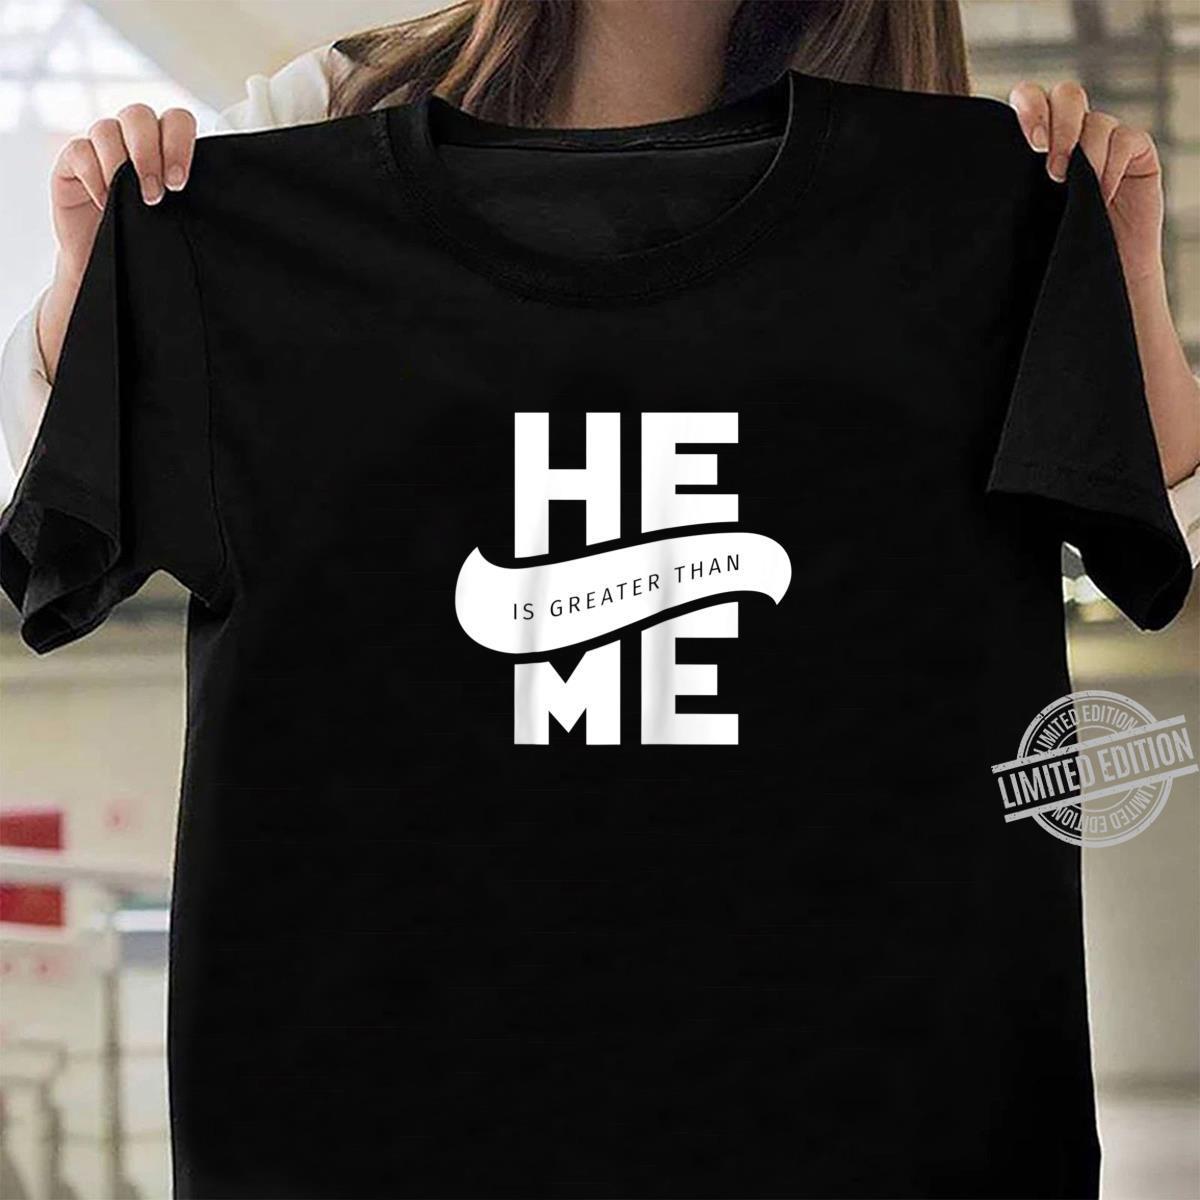 He Is Greater Than Me I John 330 Verse Christian Bible Shirt Lord take me anyway you want. john 330 verse christian bible shirt